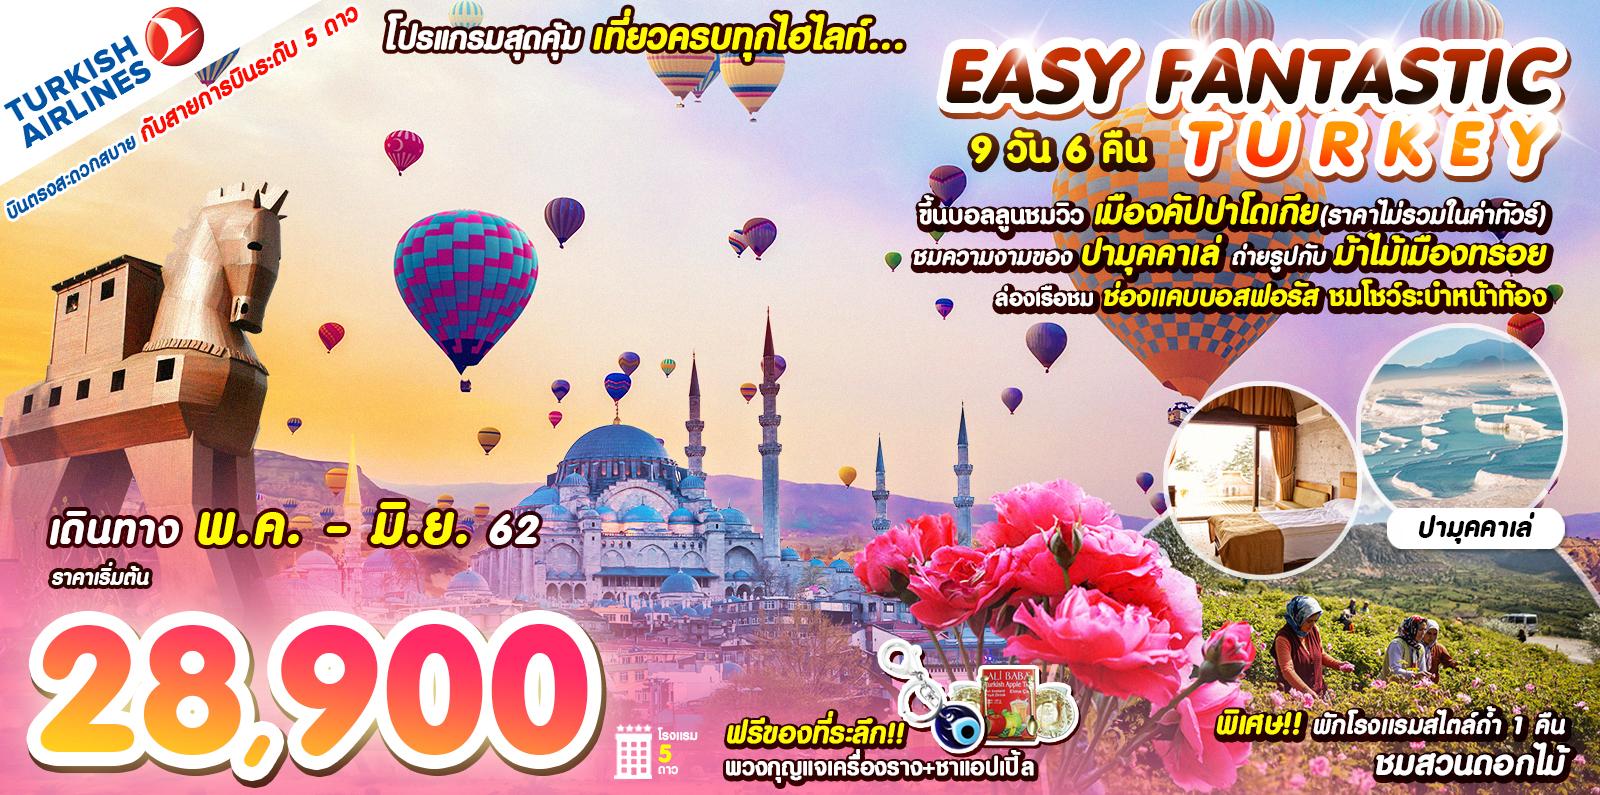 EASY FANTASTIC TURKEY (MAY - JUN 19) บินตรง TK พักโรงแรม 5 ดาว